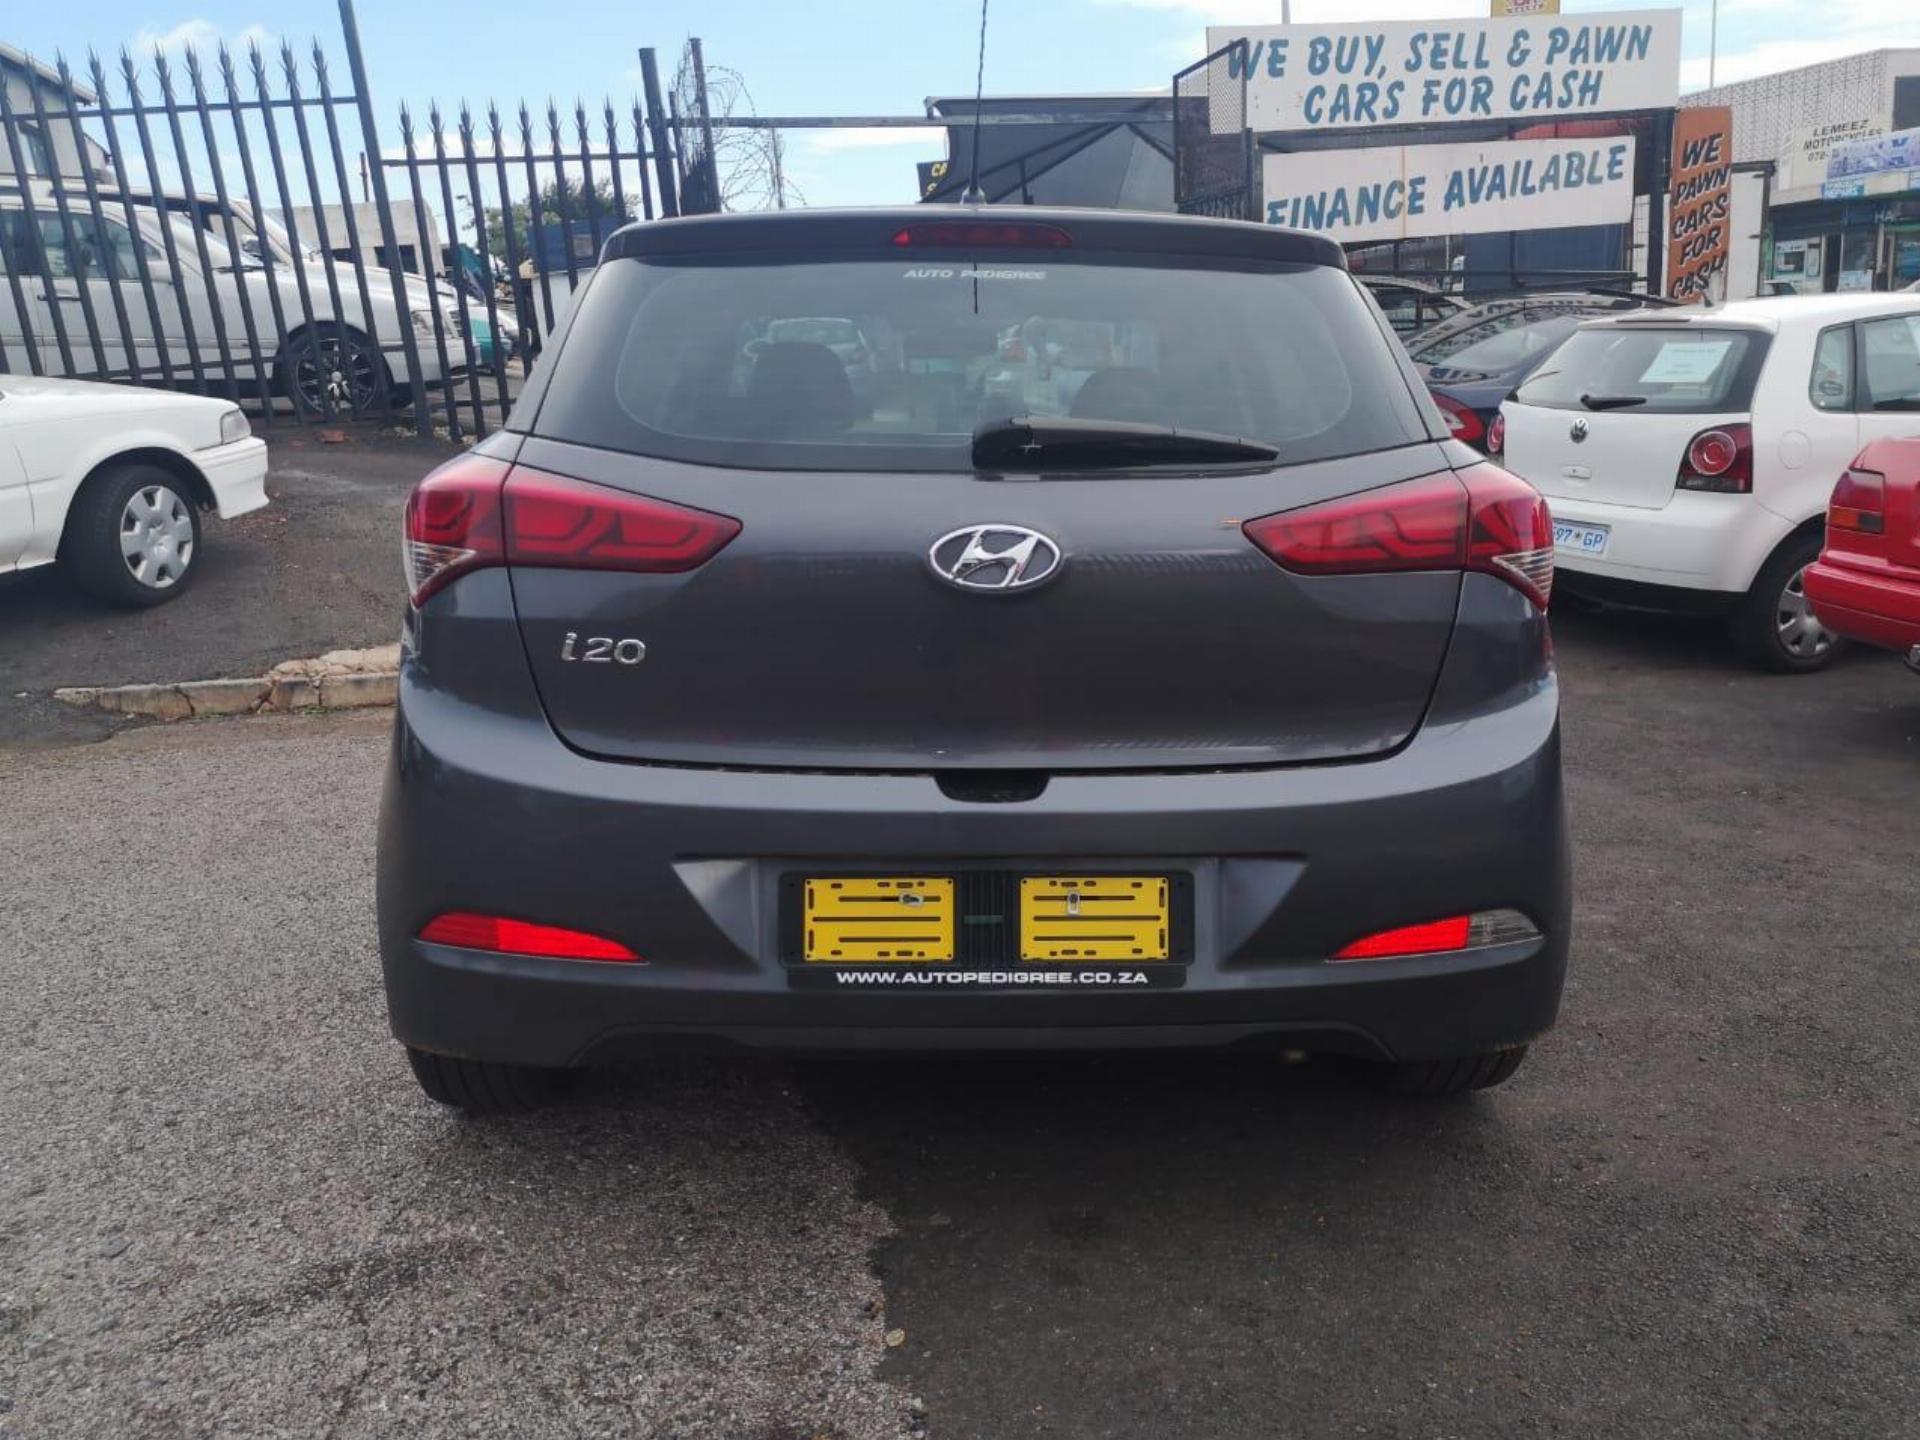 Used Hyundai I20 1 4 Fluid 2015 2015 On Auction Pv1029133